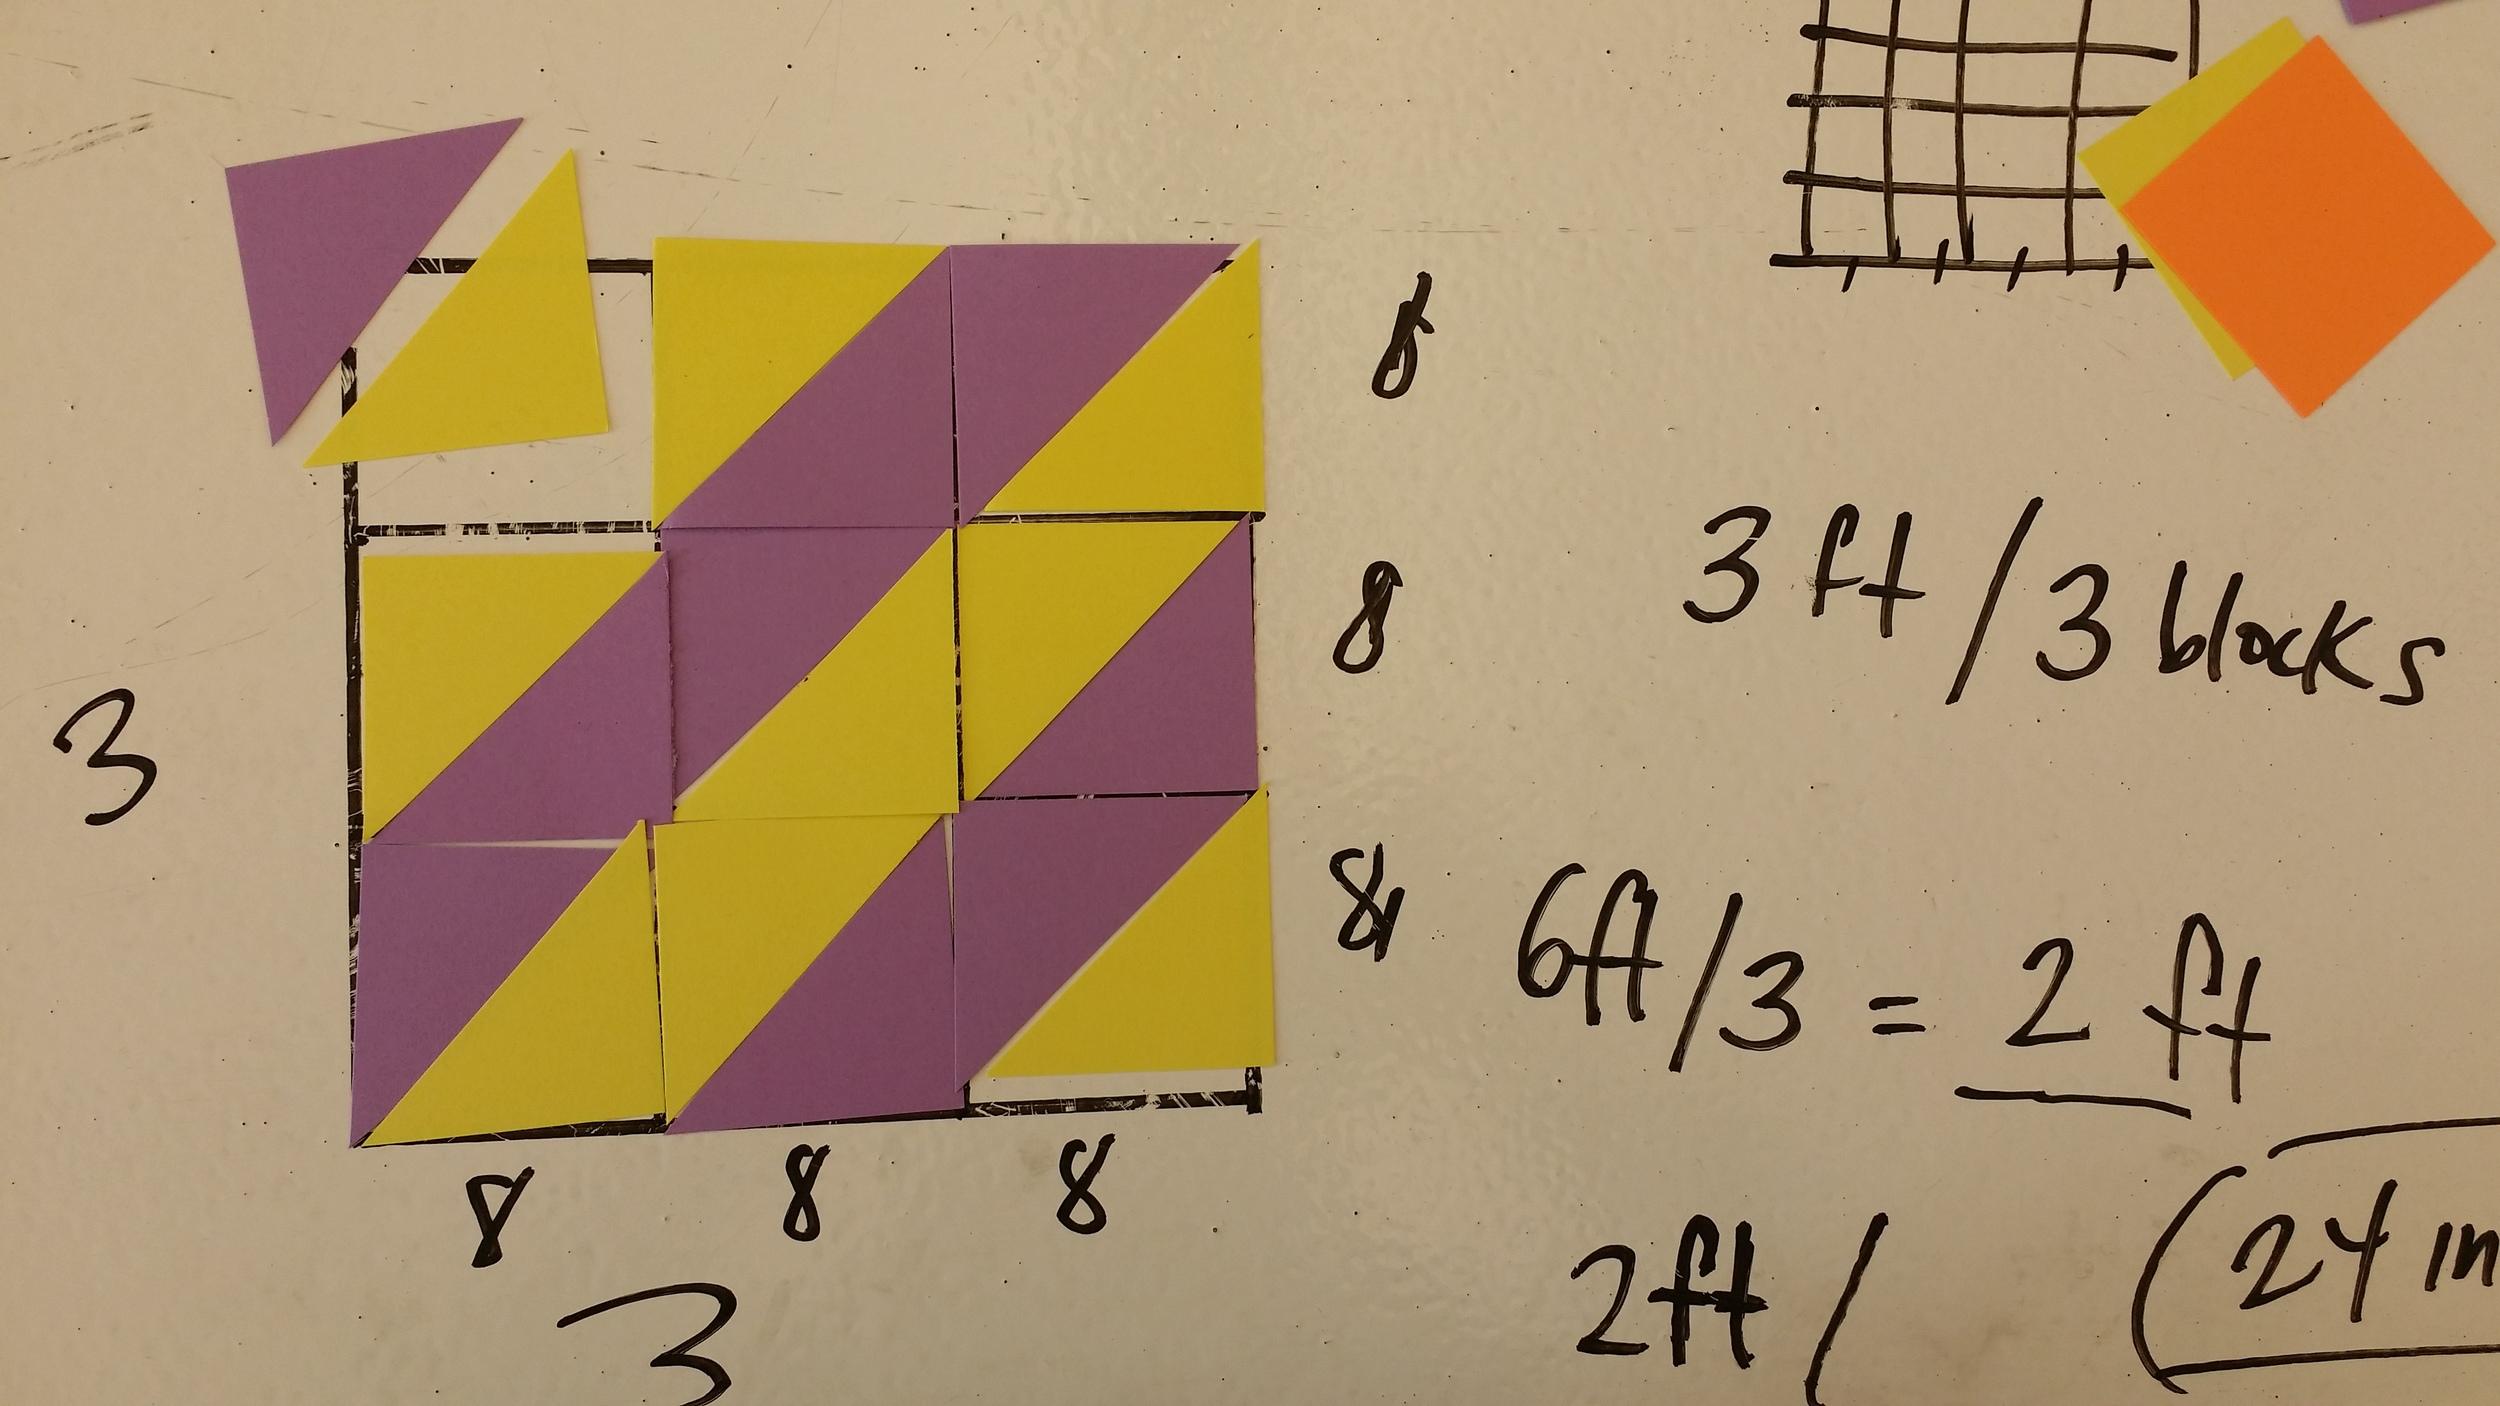 Quilting tangrams